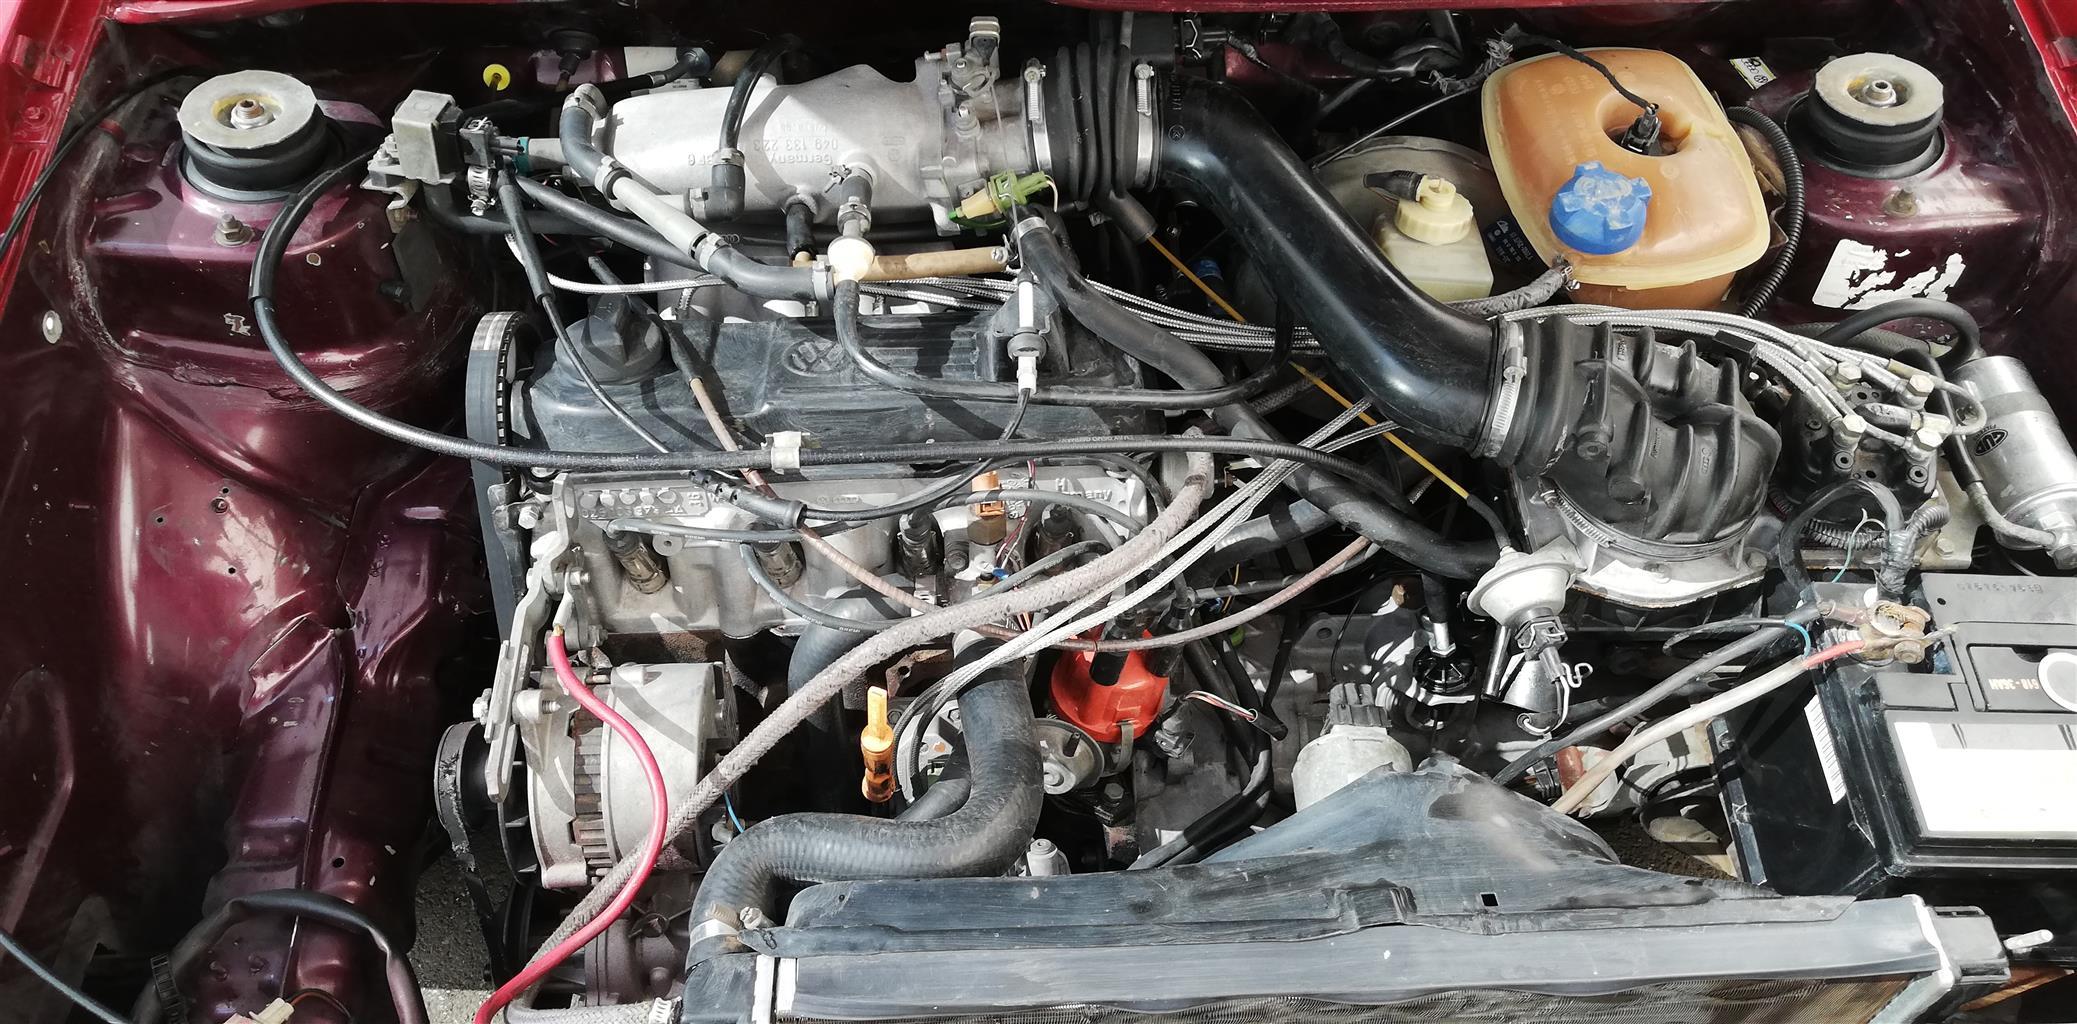 1995 VW Citi CITI 1.8i